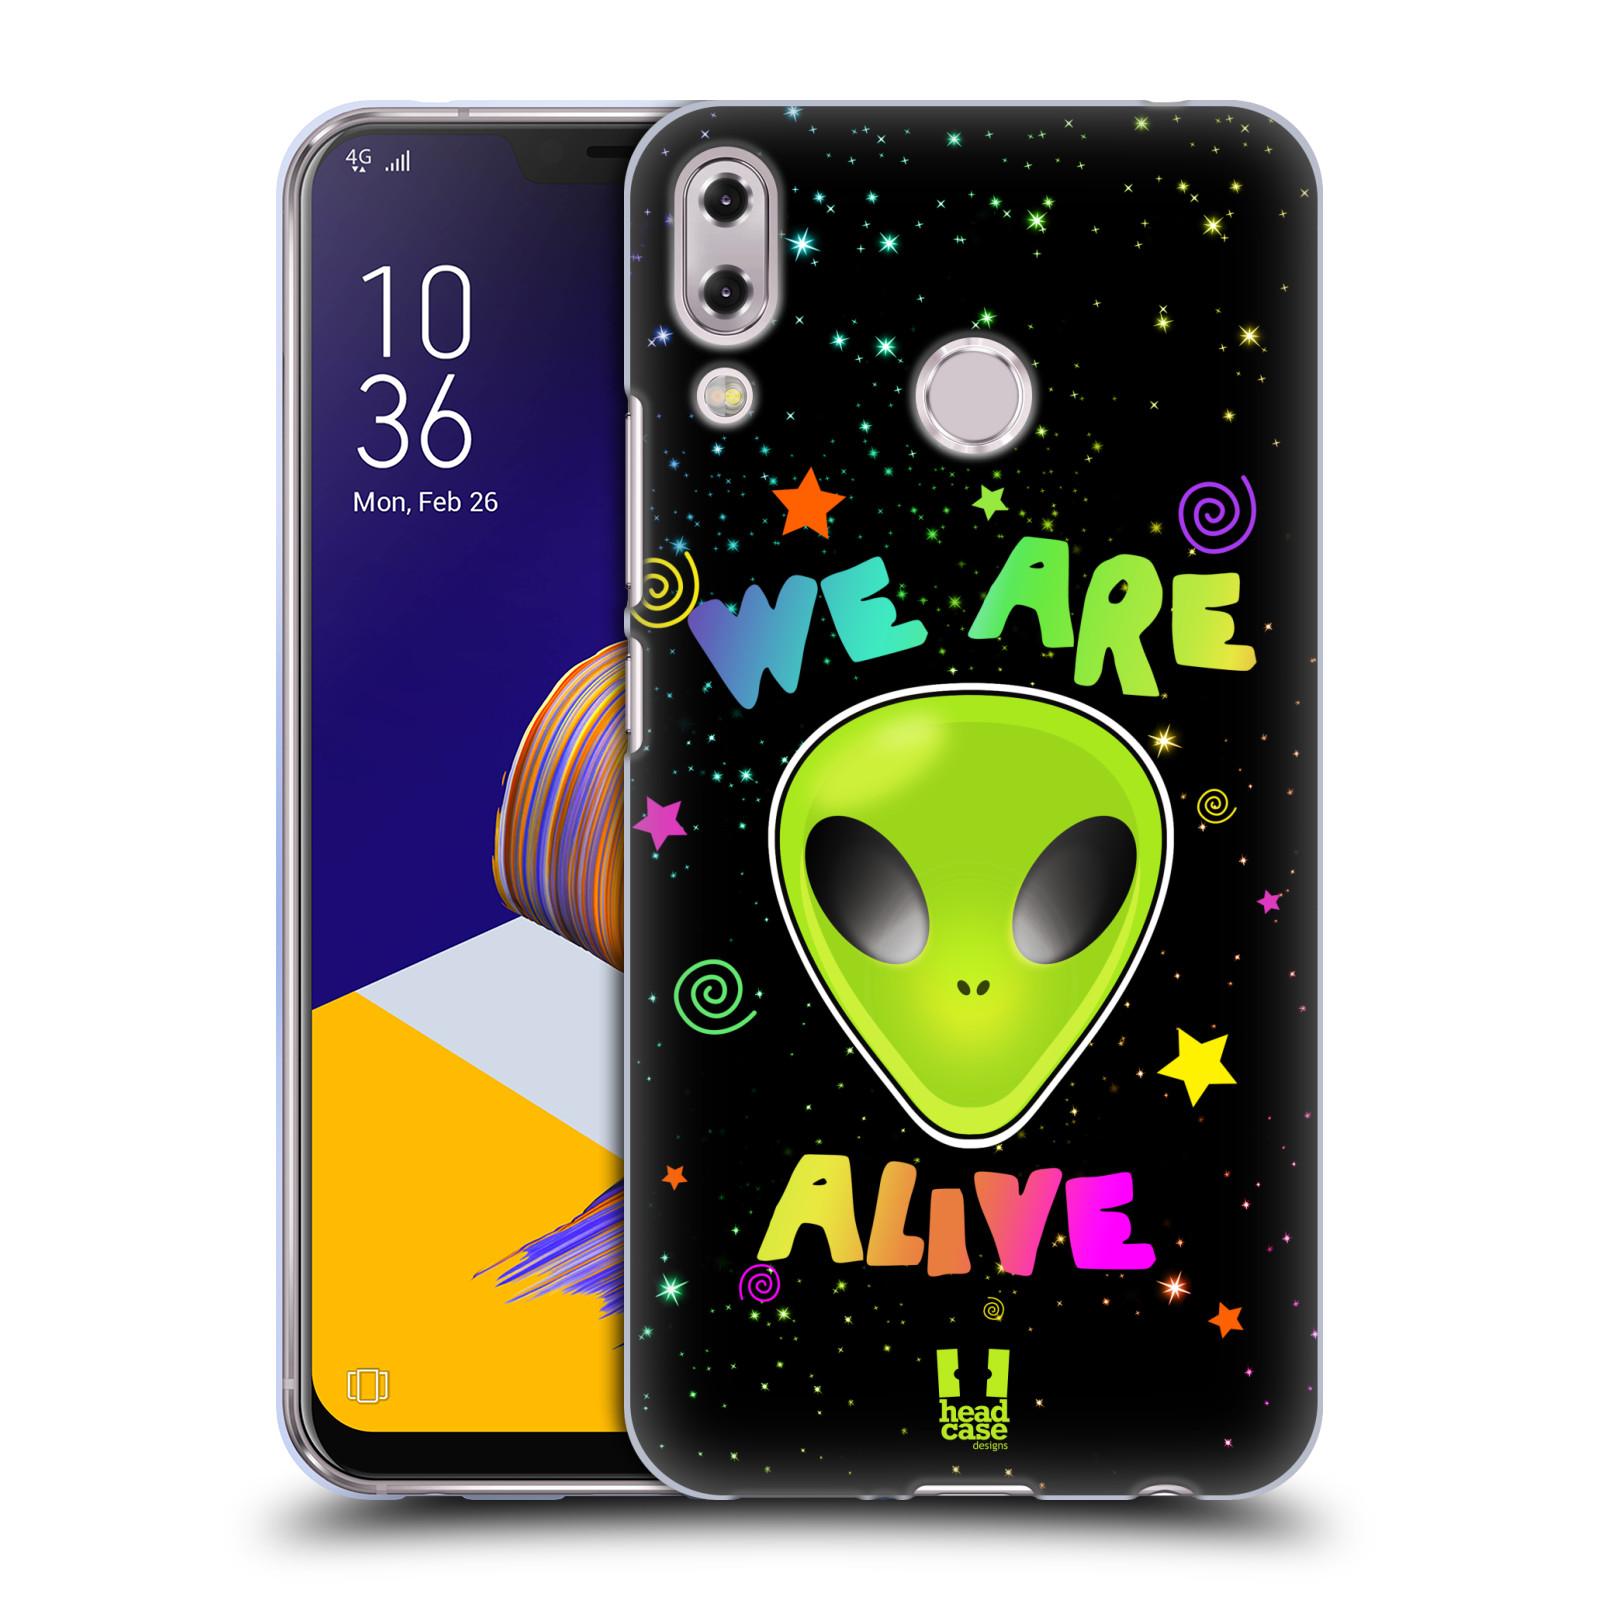 Silikonové pouzdro na mobil Asus Zenfone 5z ZS620KL - Head Case - ALIENS ALIVE